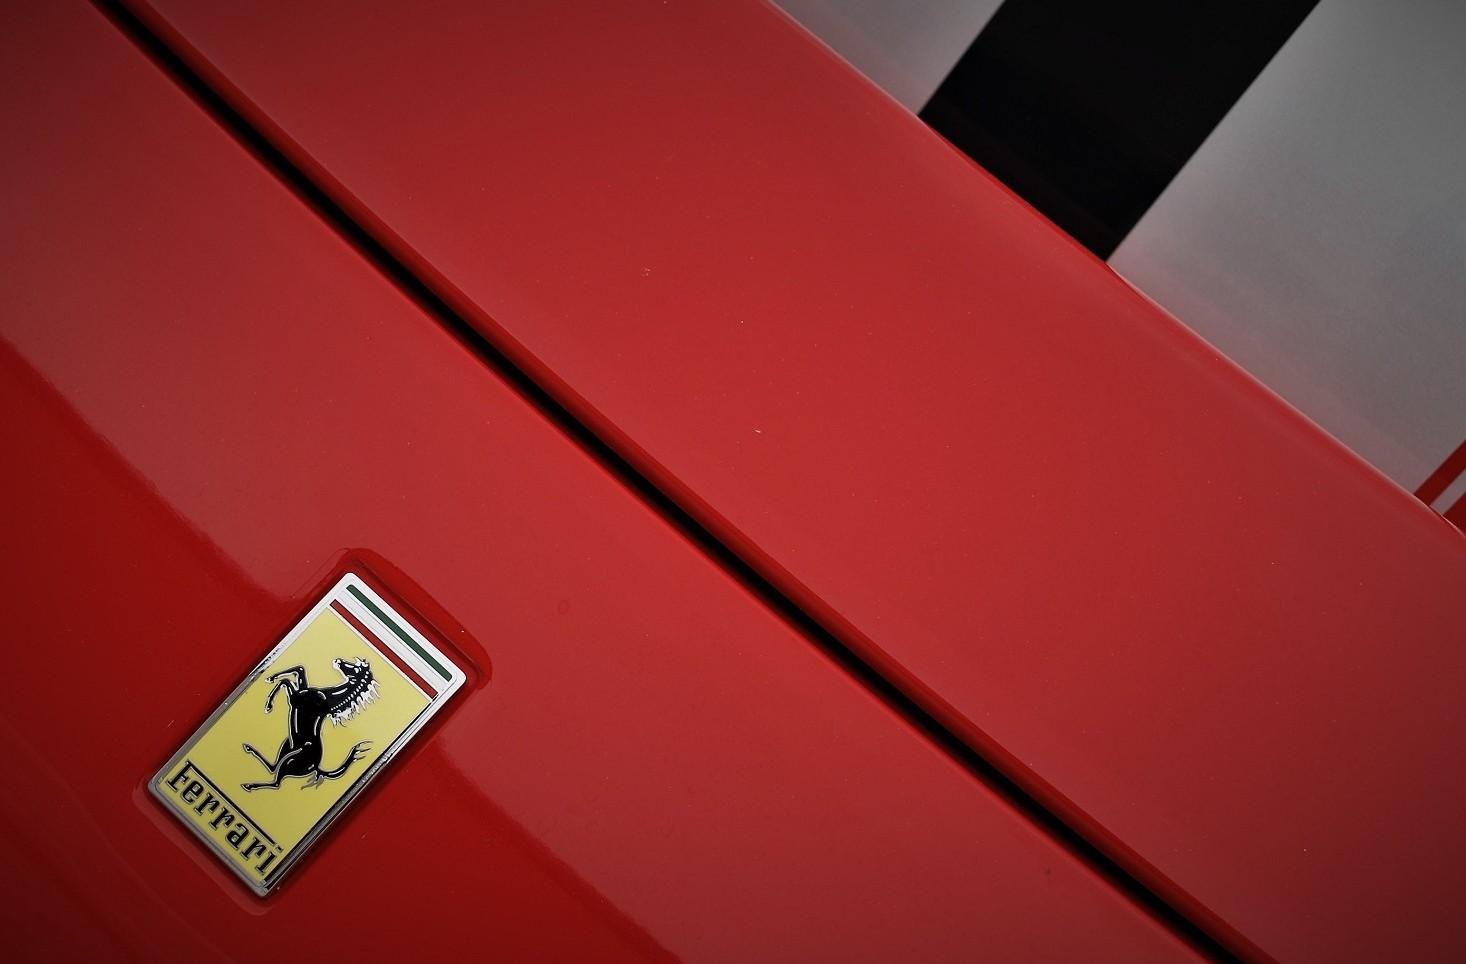 Ferrari ibrida da 1.000 CV: caratteristi